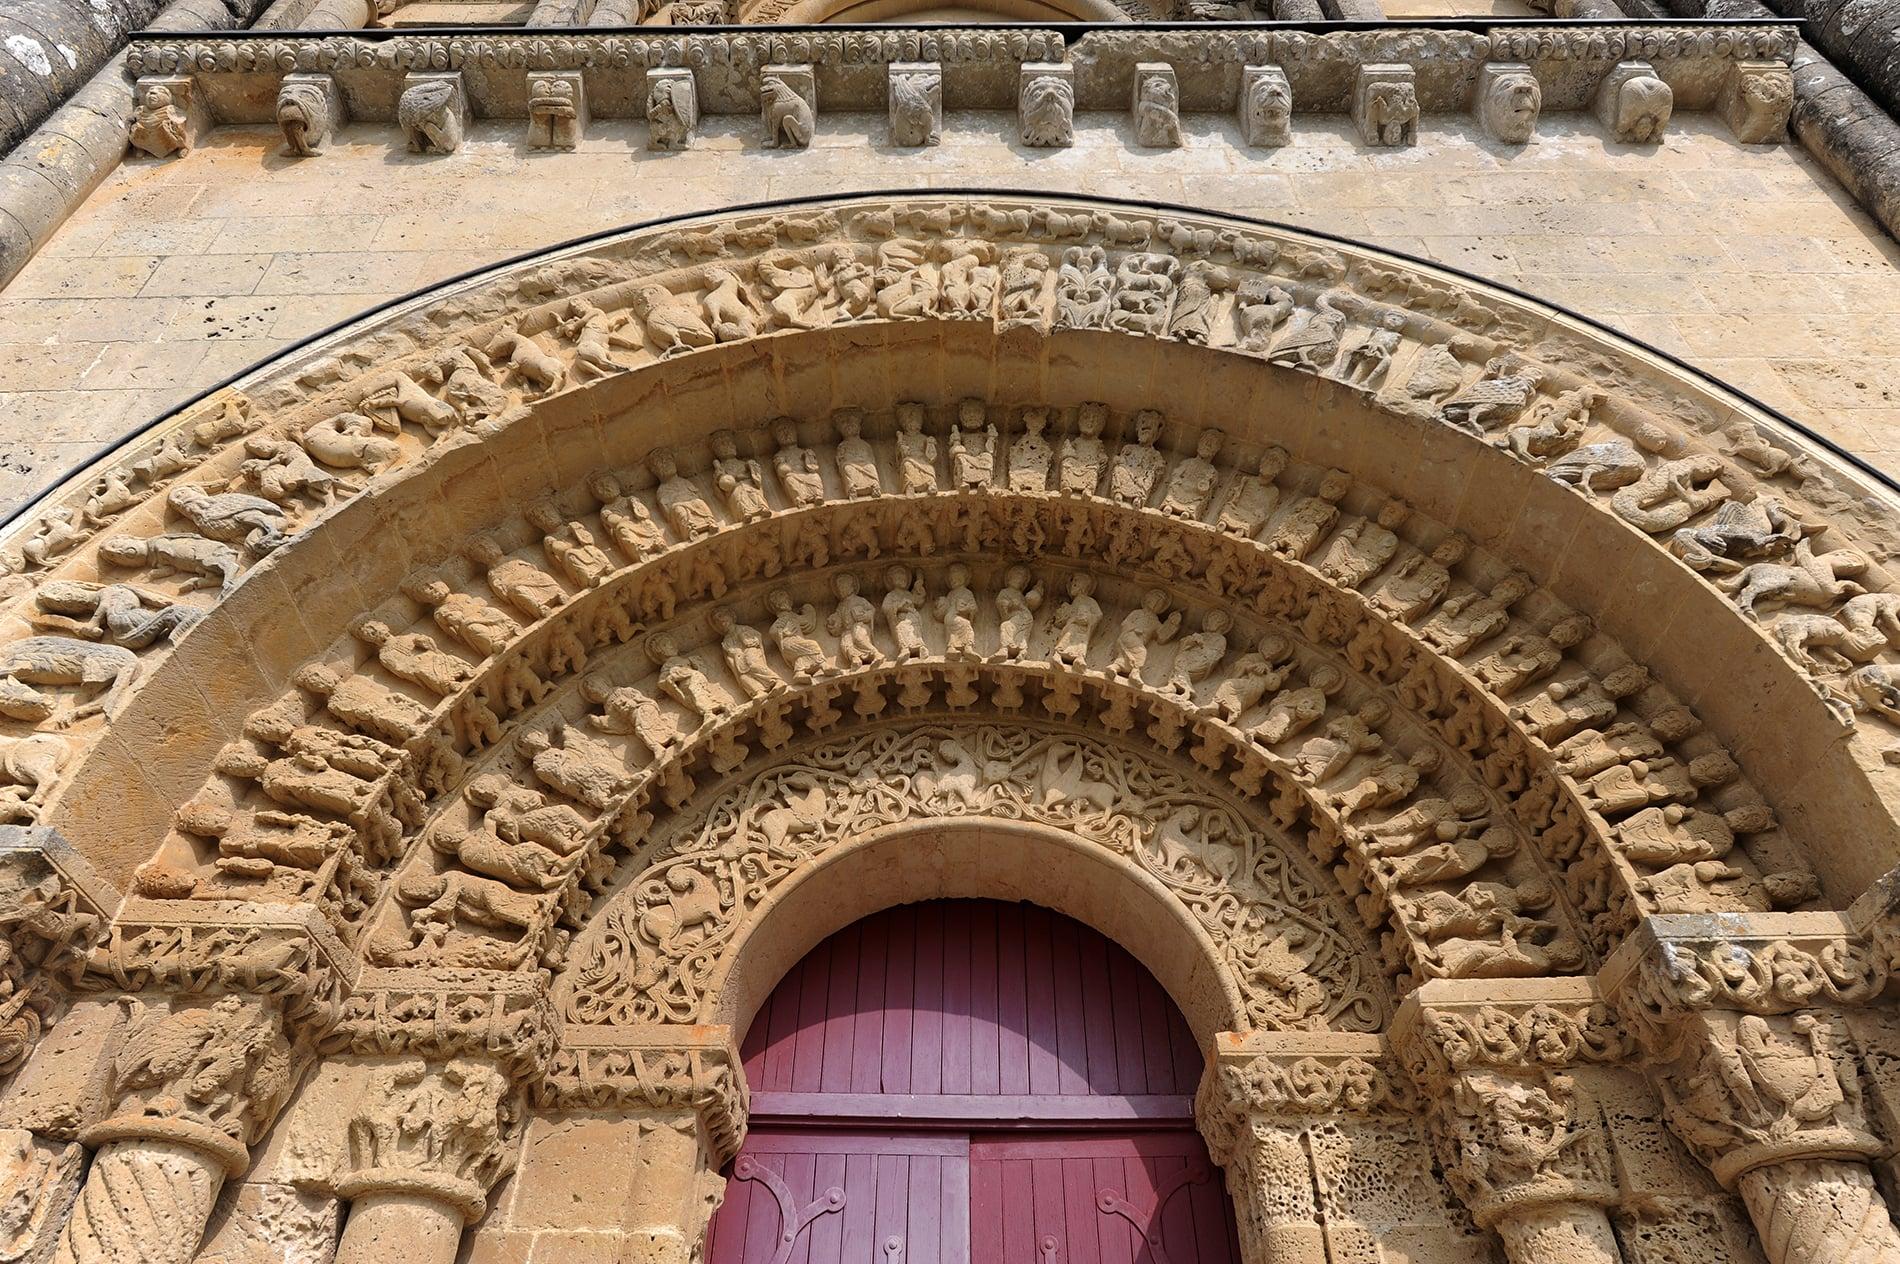 Eglise Saint-Pierre©ACIR / JJ Gelbart